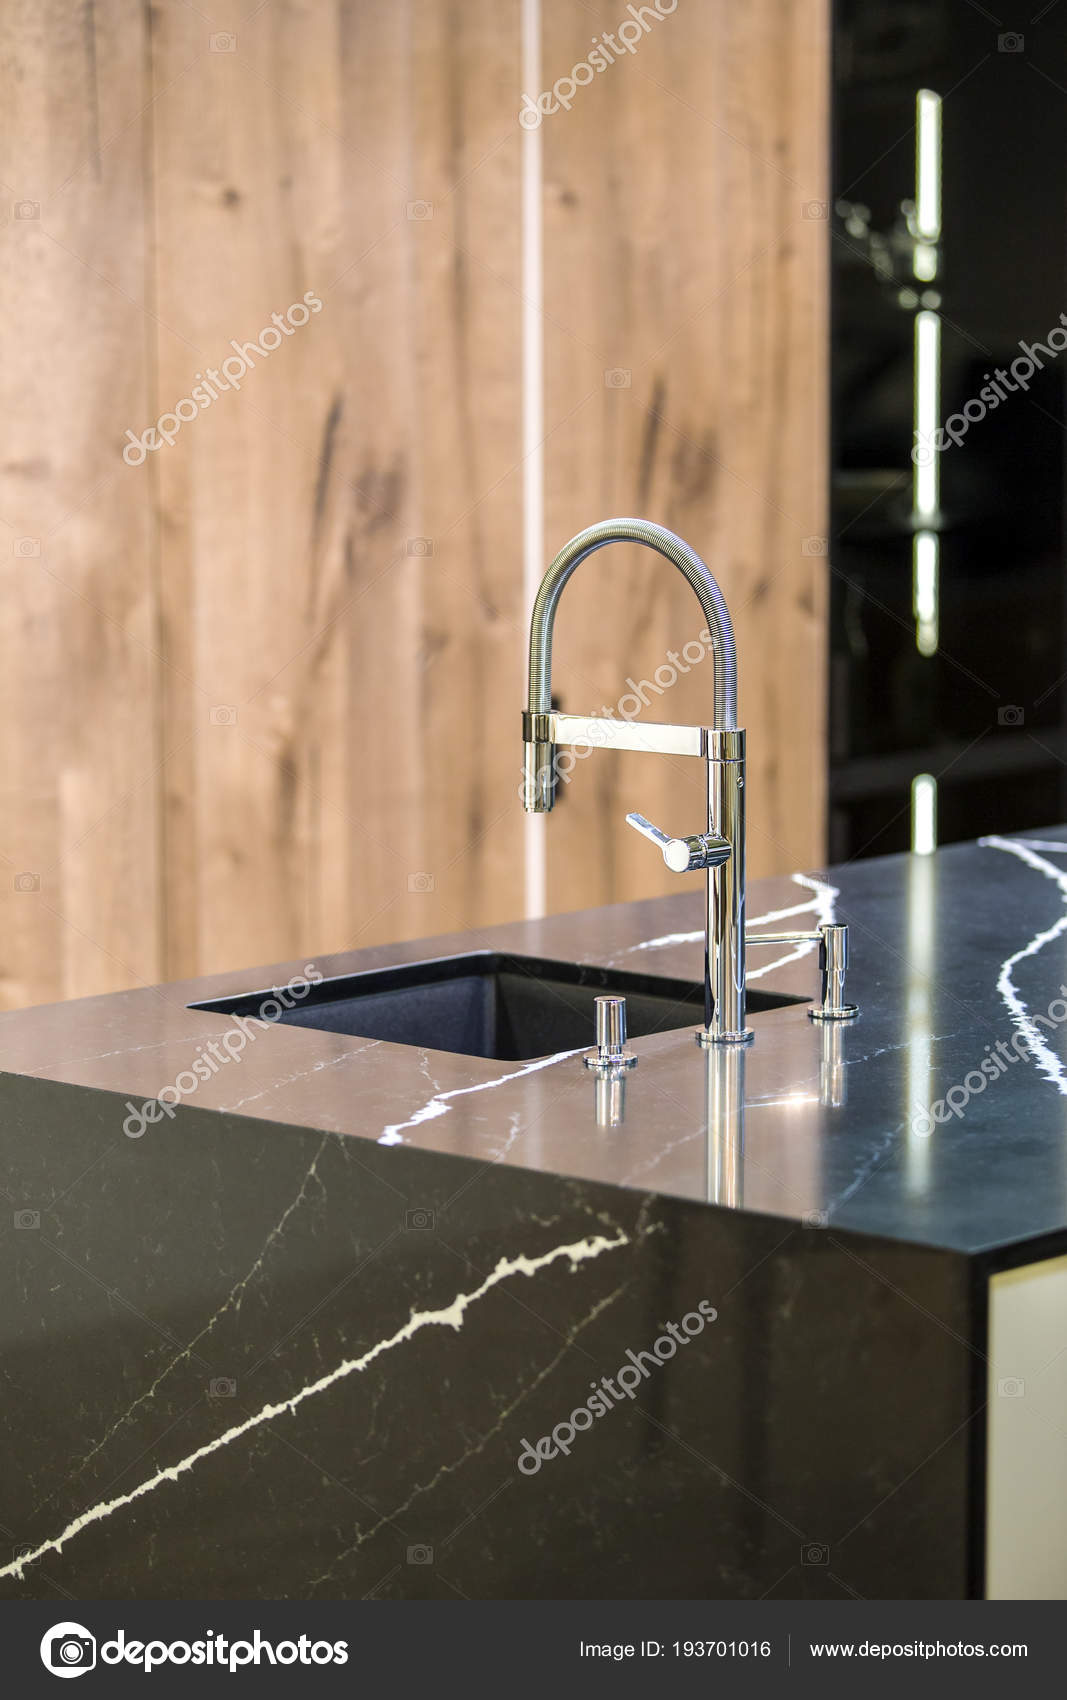 luxury kitchen faucets pendant lighting 厨房龙头 现代厨房 阁楼风格 黑色大理石桌 木制豪华厨房 图库照片 照片作者olga prava